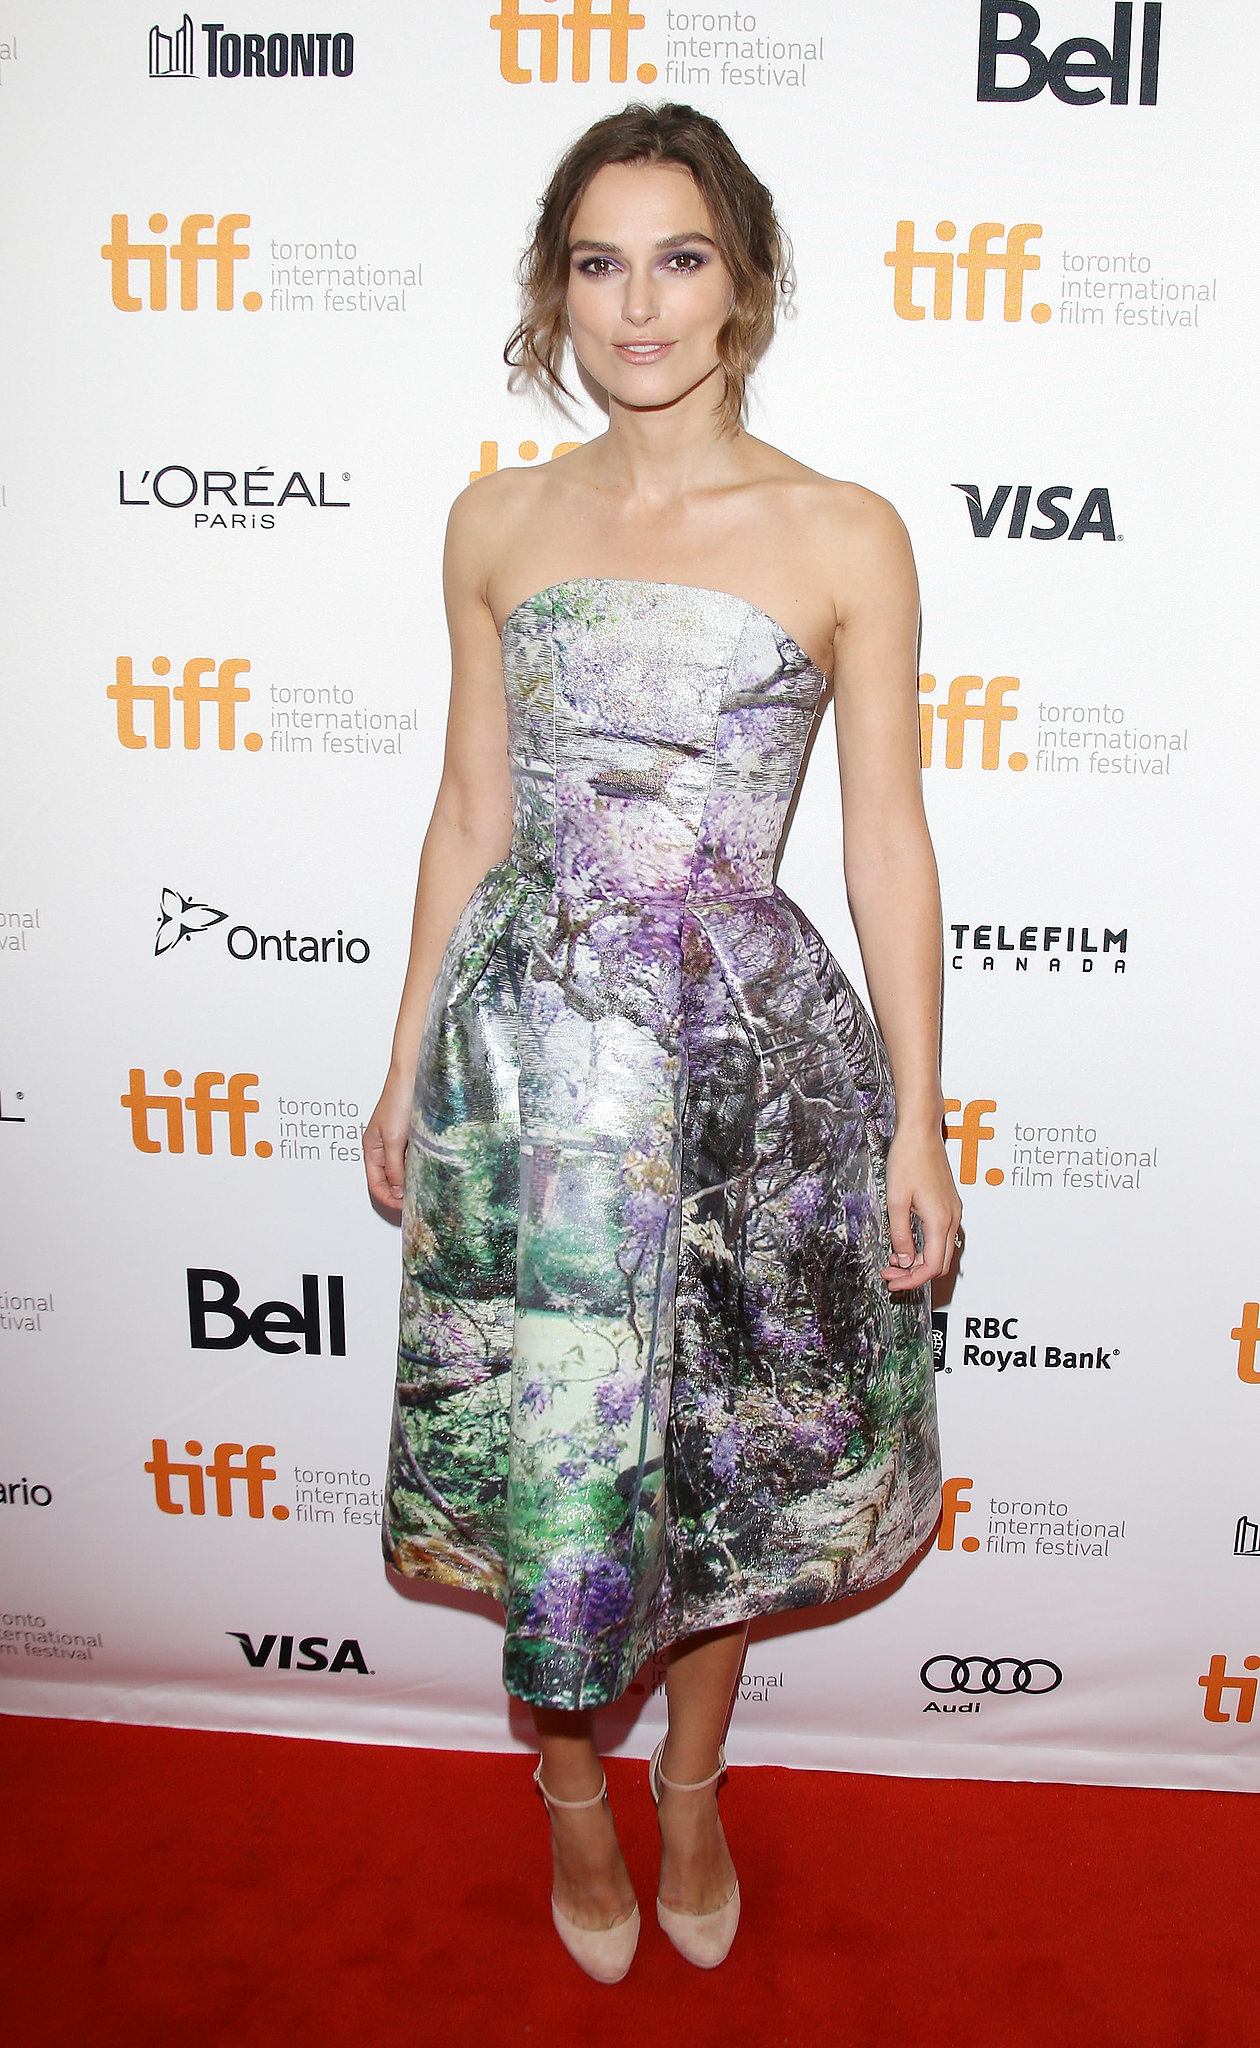 Keira Knightley the 2013 Toronto Film Festival